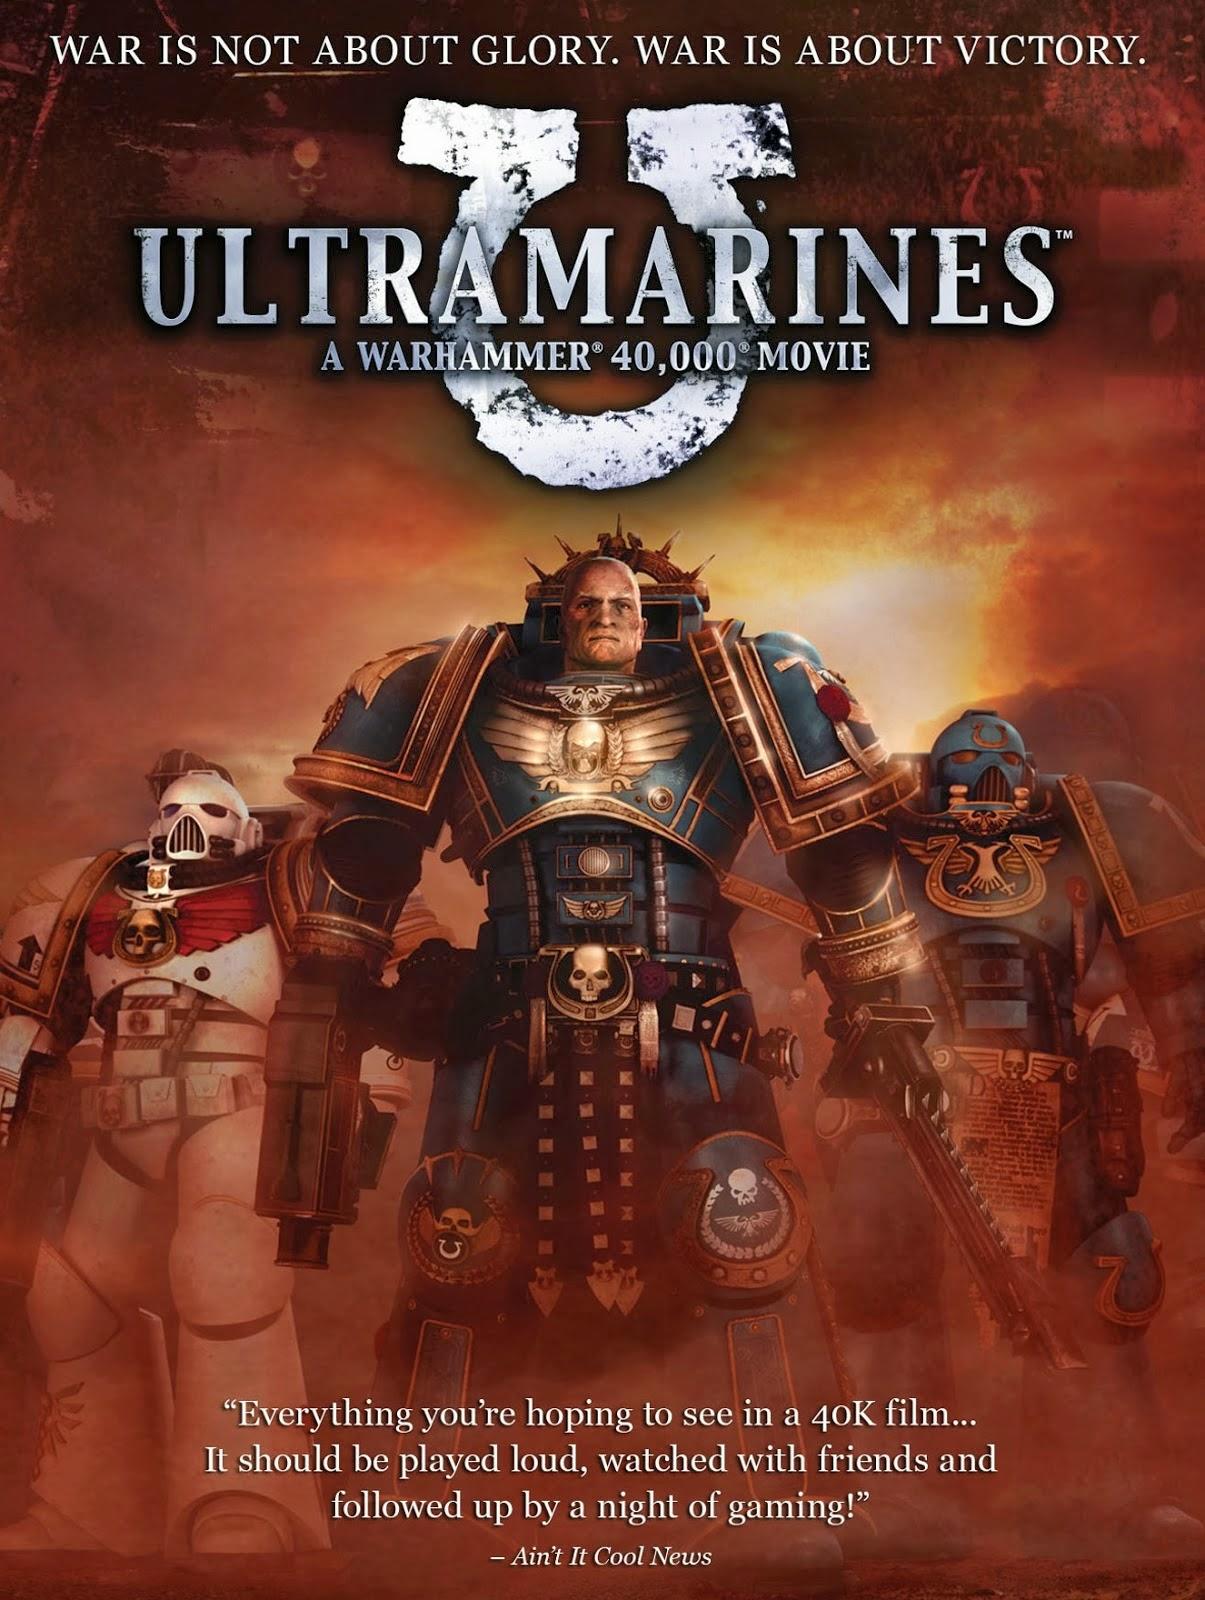 http://superheroesrevelados.blogspot.com.ar/2014/01/ultramarines-warhammer-40000-movie.html